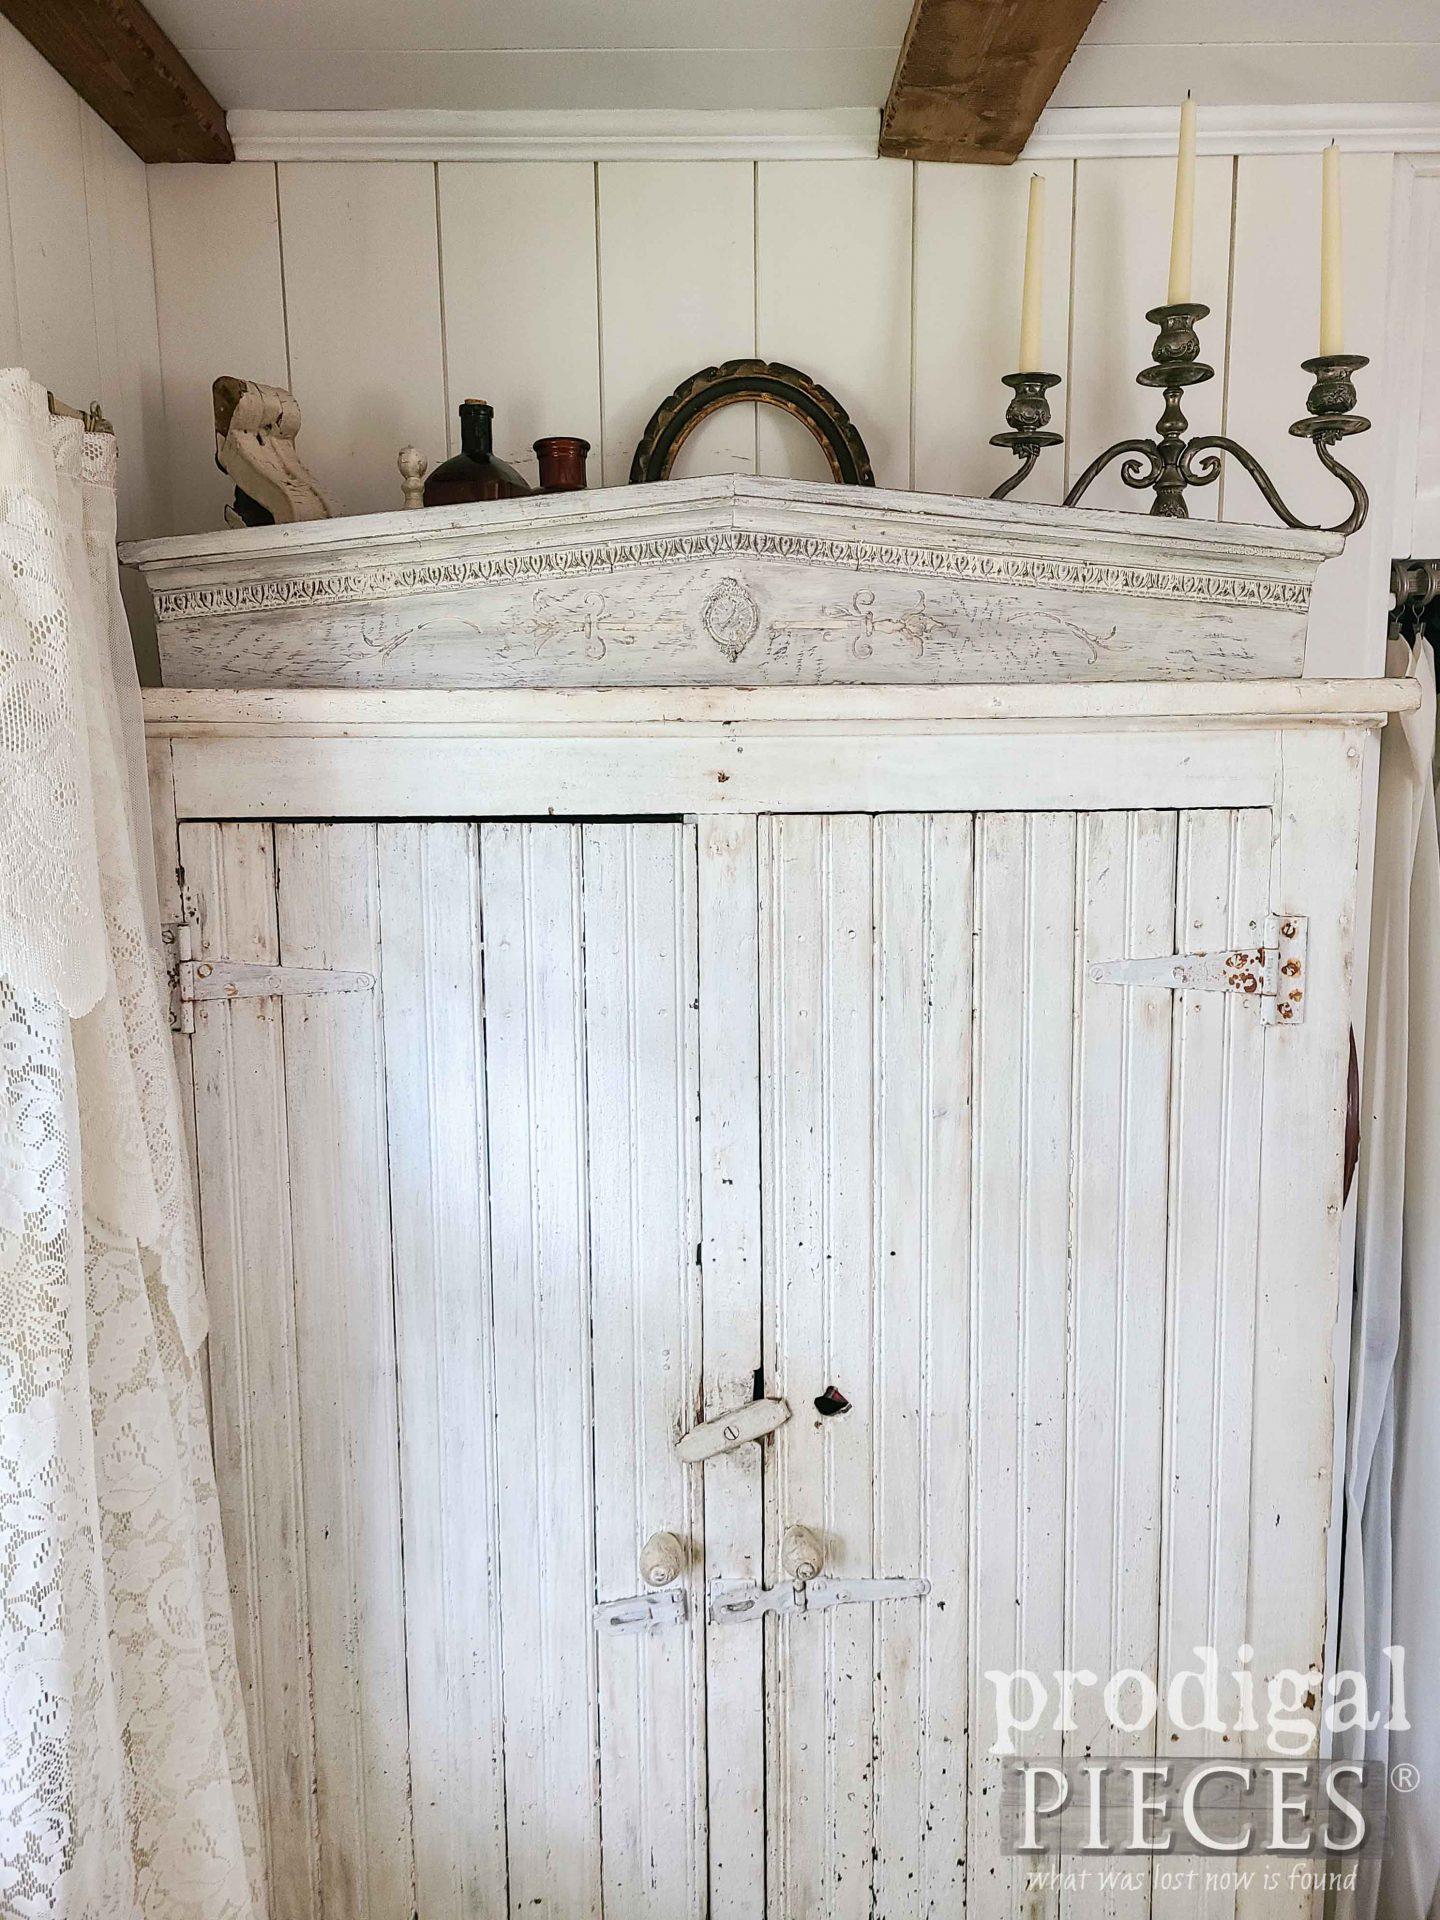 Antique Cupboard with Farmhouse Pediment by Larissa of Prodigal Pieces | prodigalpieces.com #prodigalpieces #farmhouse #diy